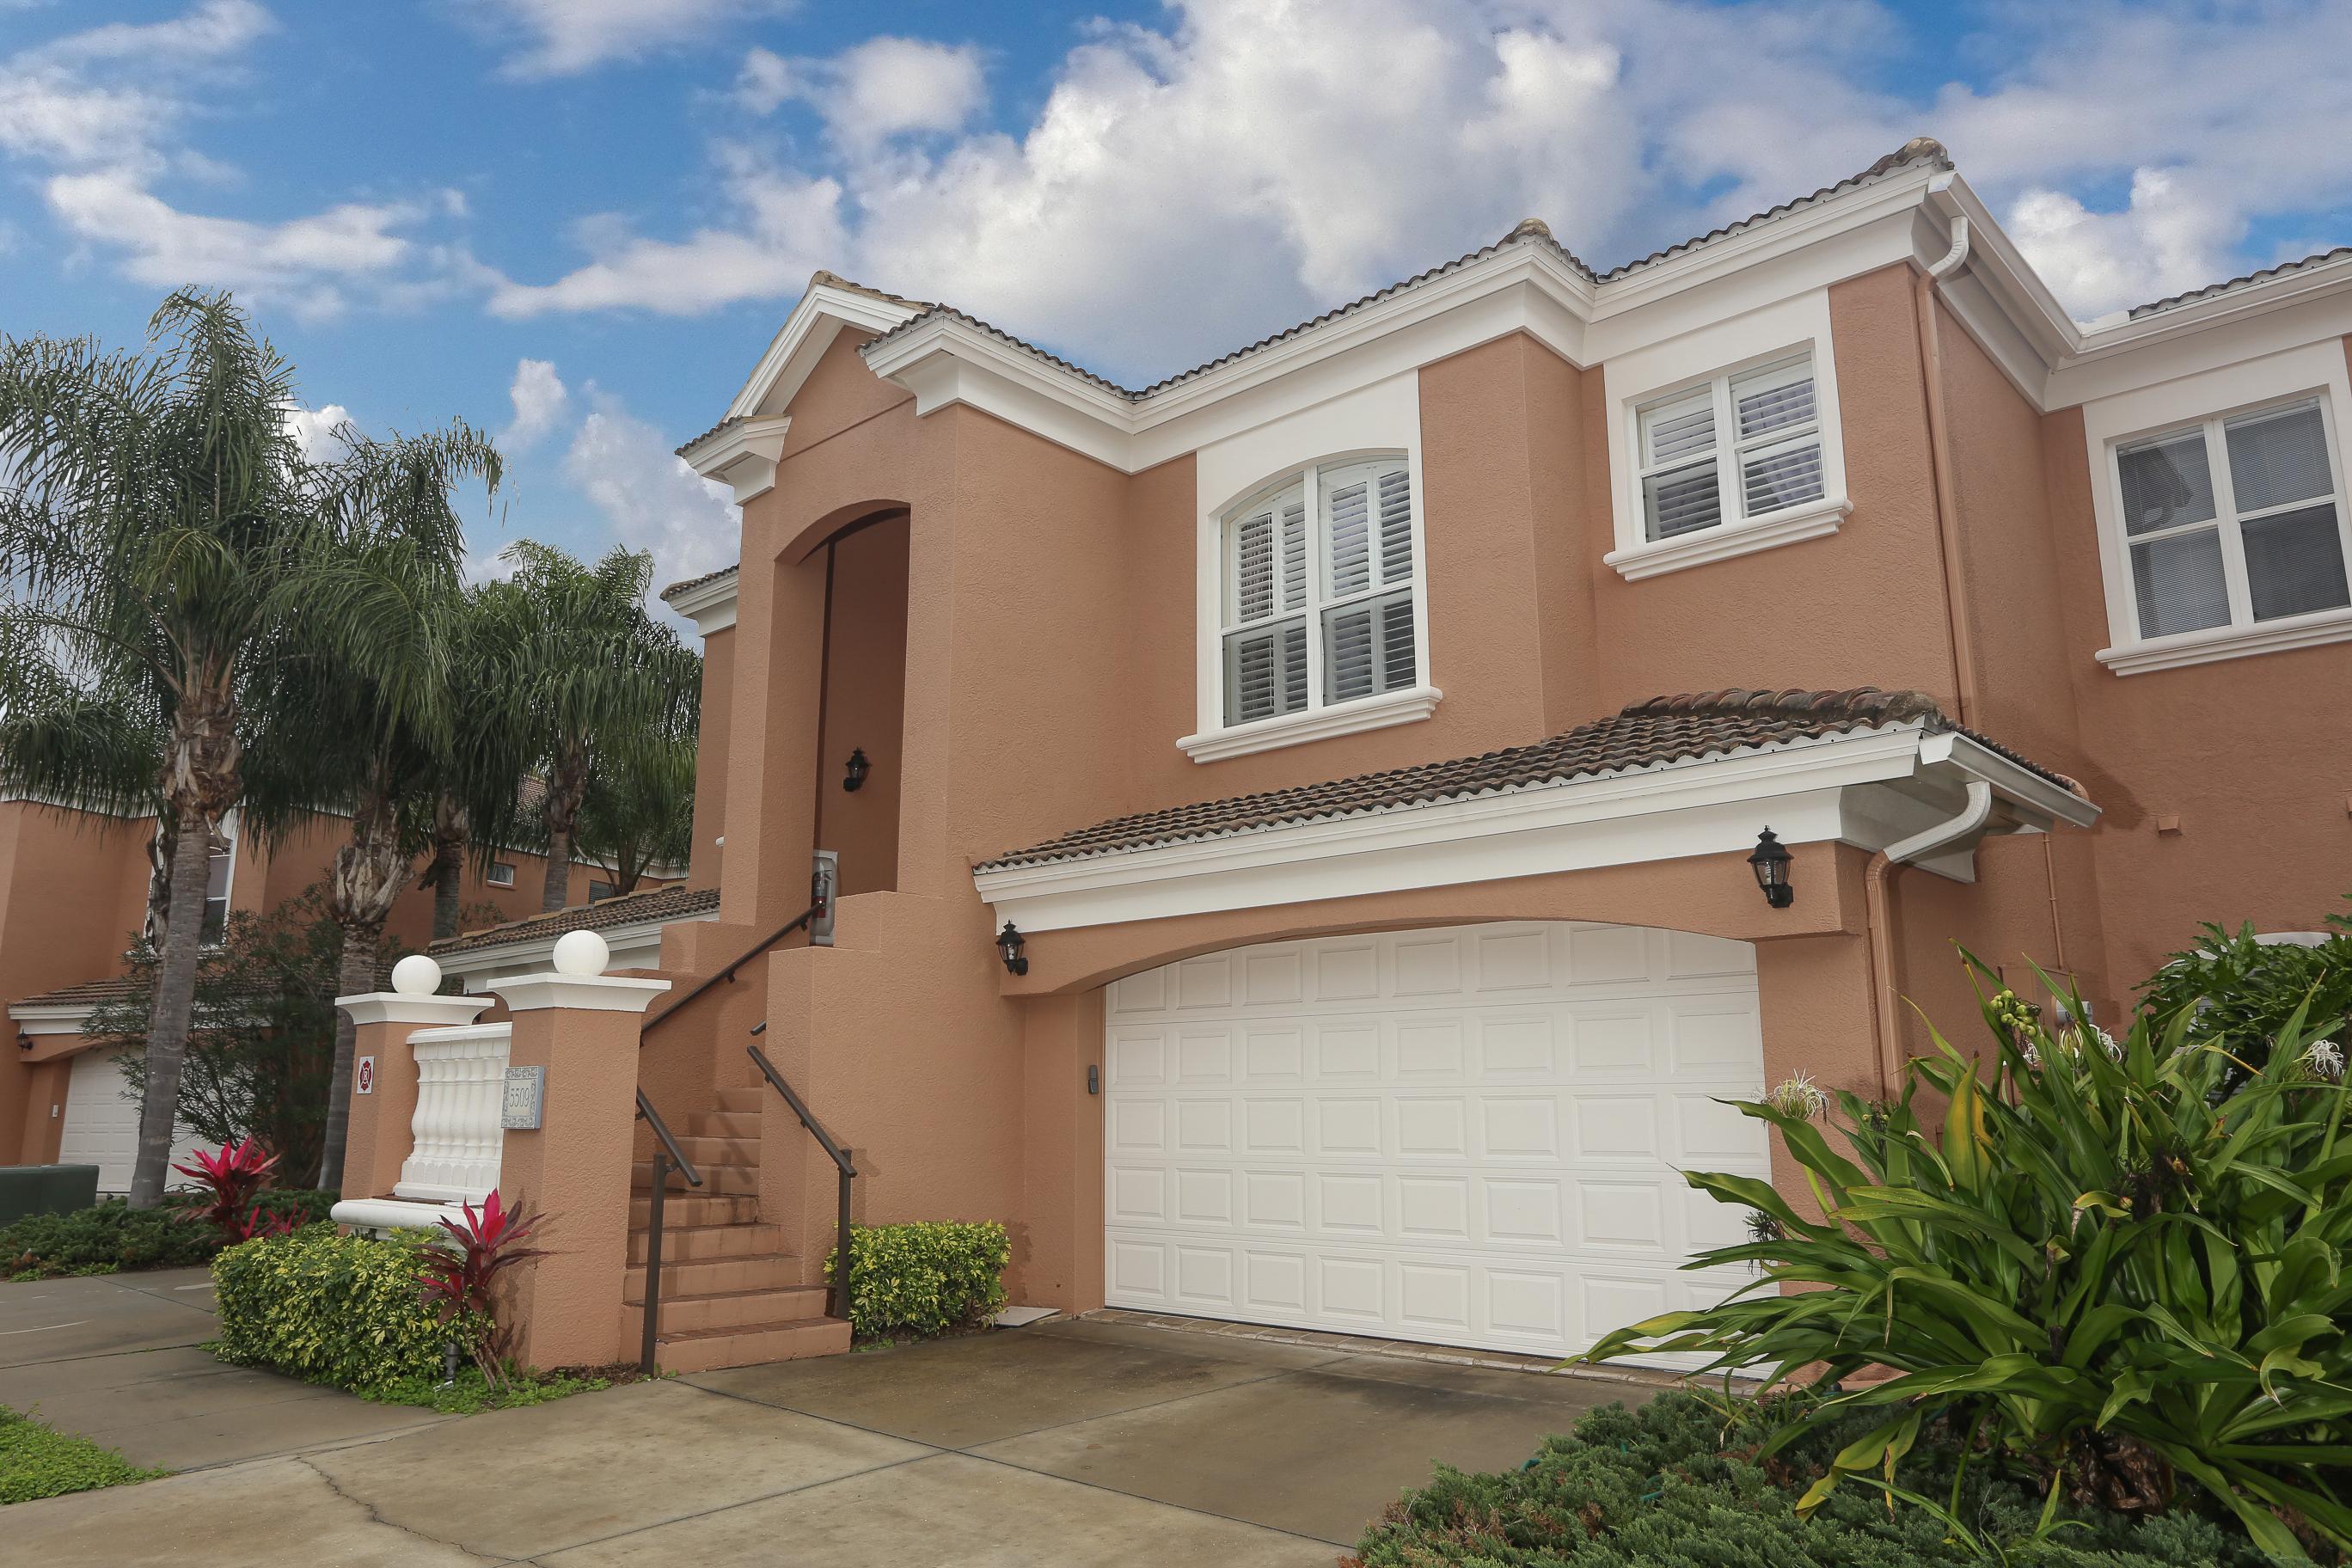 Villas / Townhouses for Rent at 5509 46th Ct W, Bradenton, FL 34210 Bradenton, Florida,34210 United States